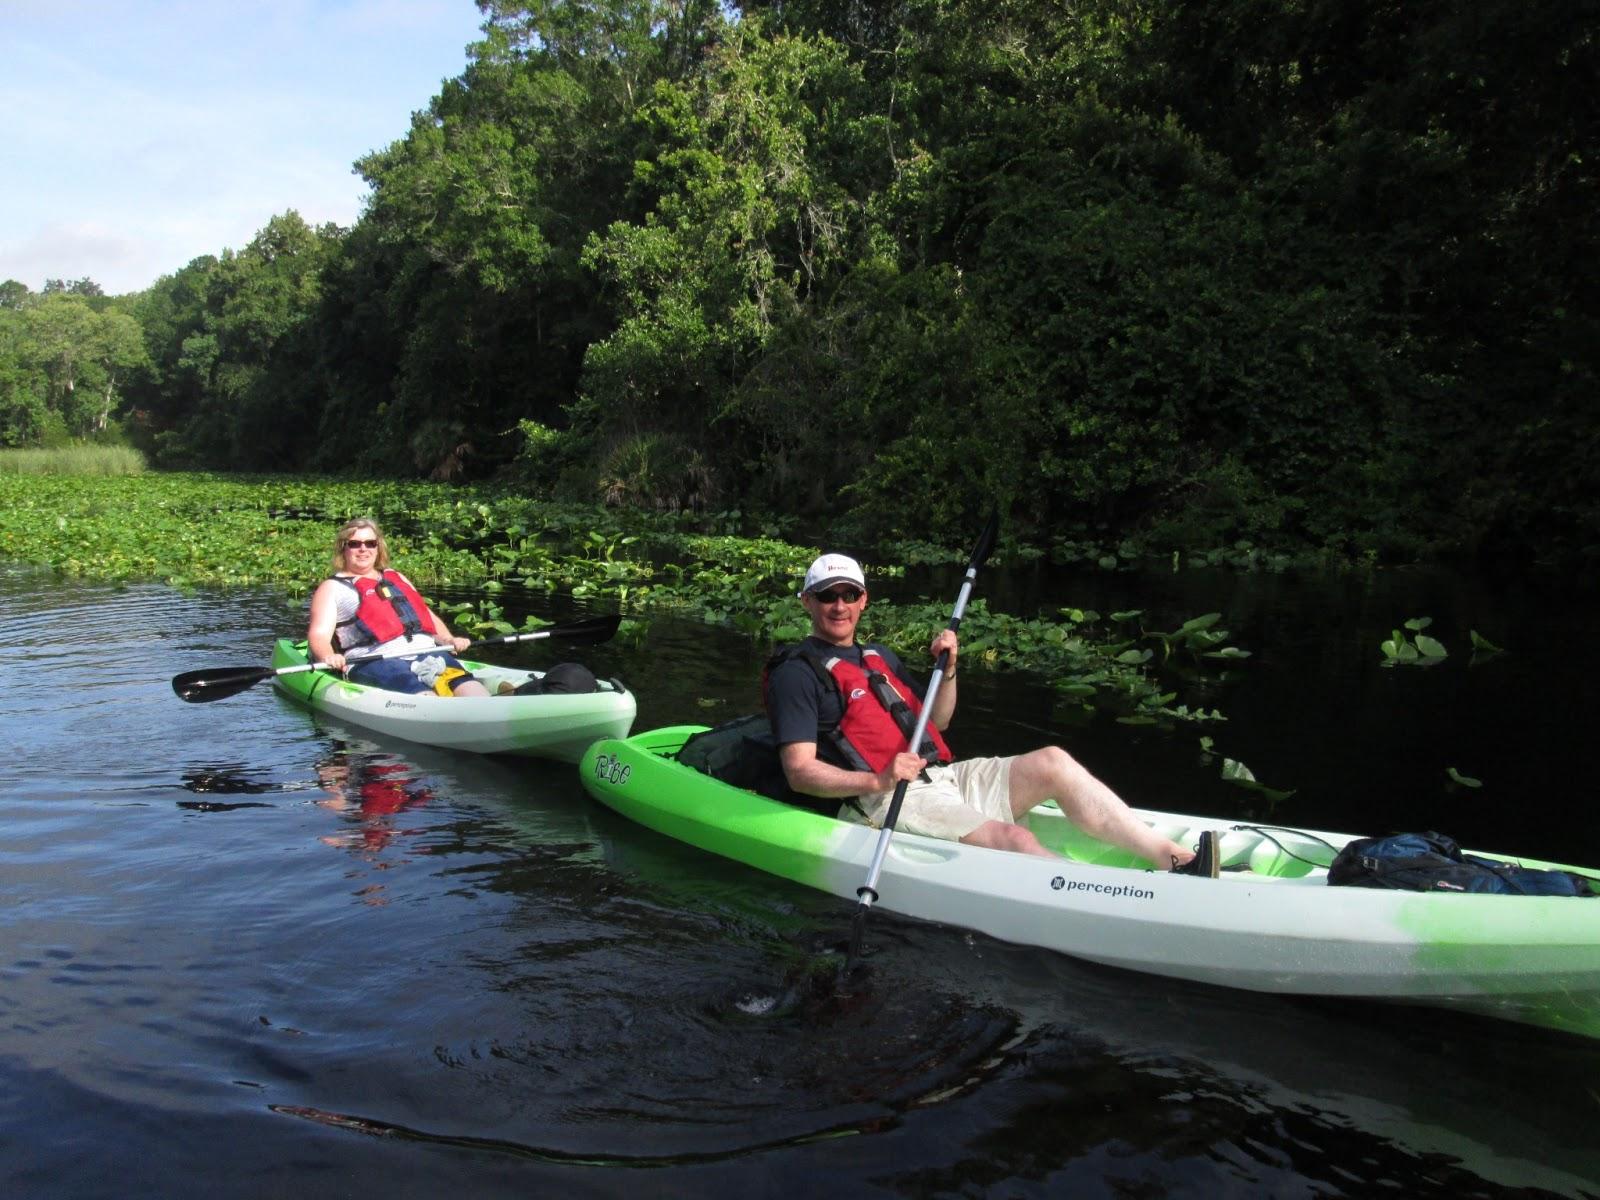 Kayaking near Orlando, Florida: Our Florida Vacation ...